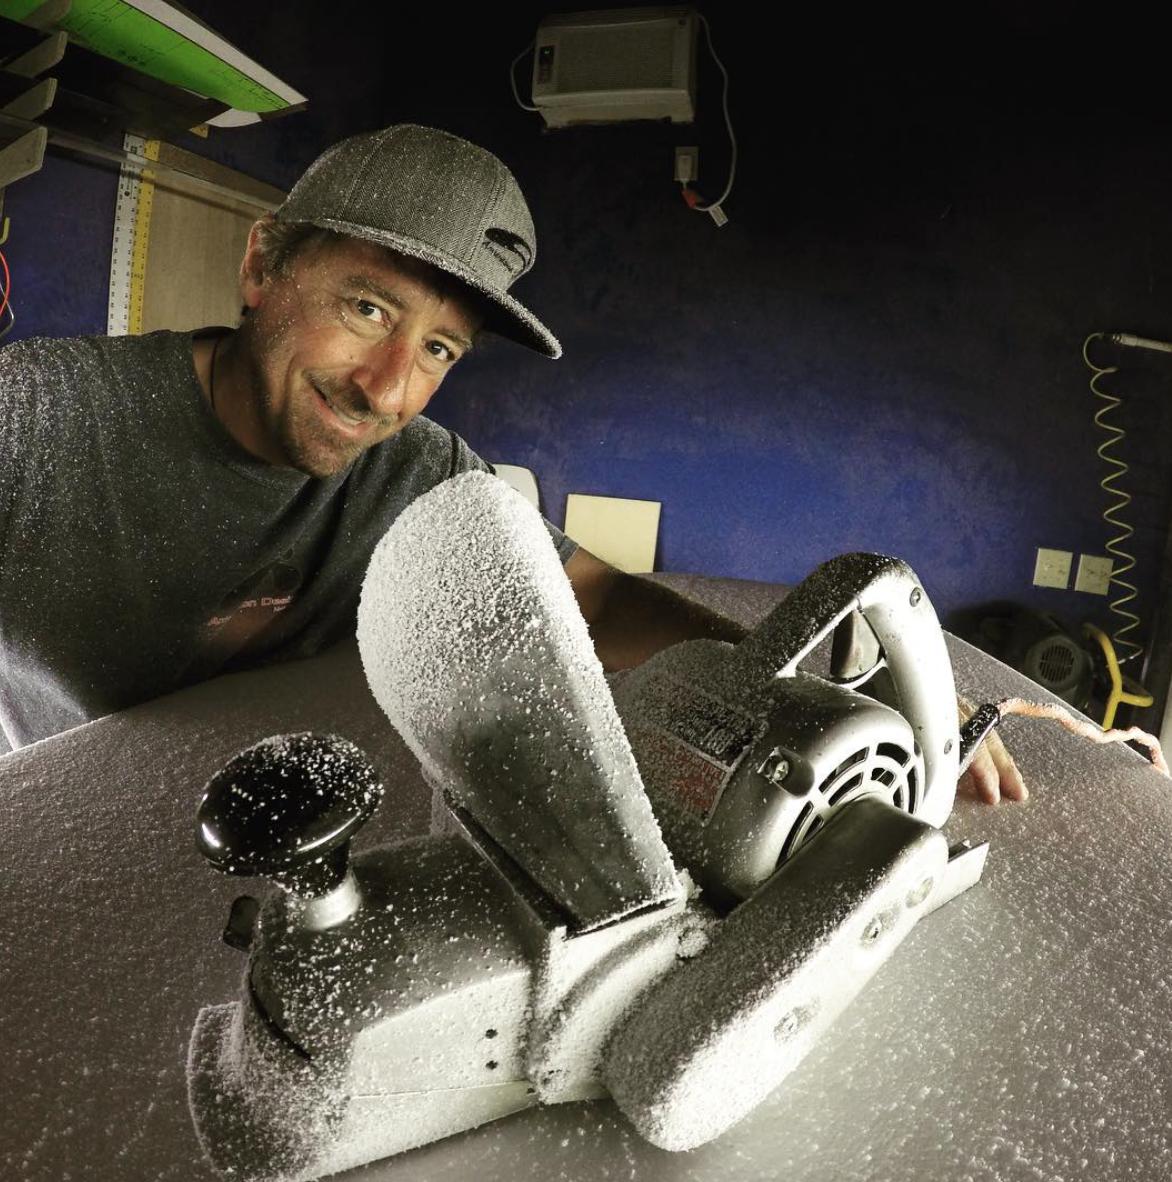 John Amundson  Kite Surfer / Surfer / Waterman / Shaper, Designer, Innovator / Kind, Soulful, Laidback Human   Follow John on Instagram